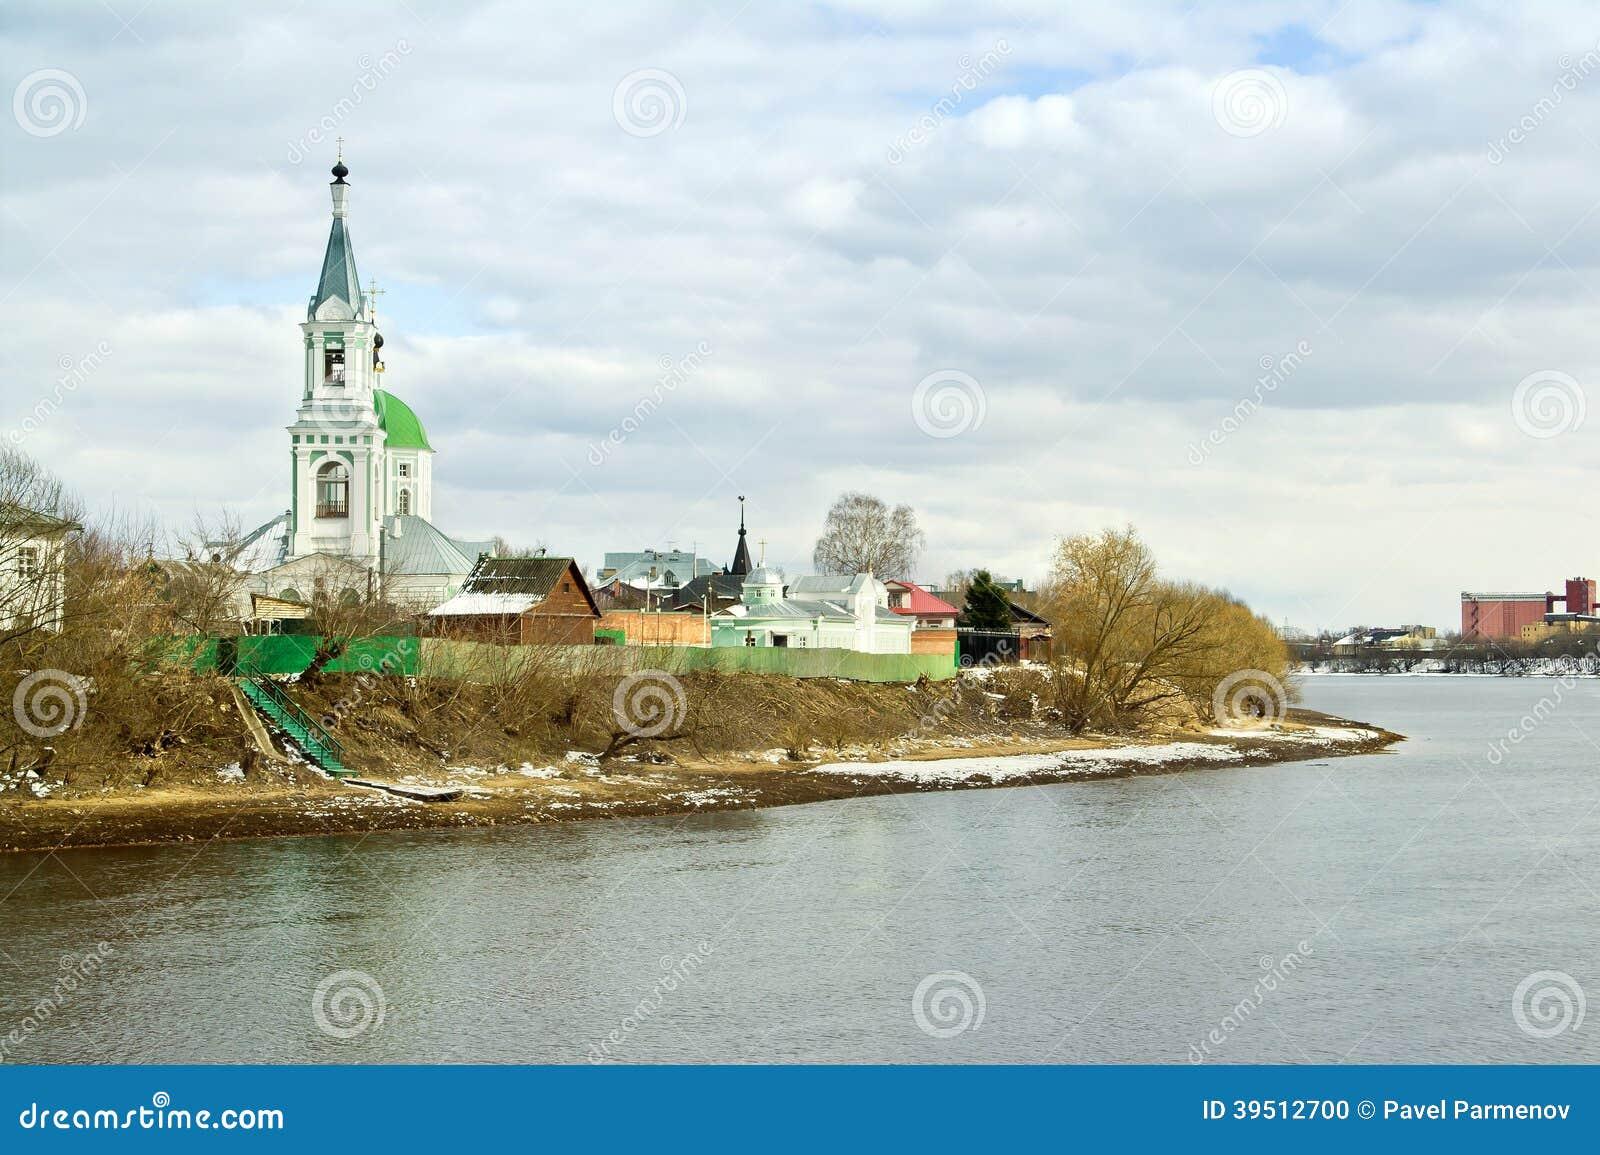 Tver. Μονή καλογραιών της Catherine. Εκκλησία της Catherine